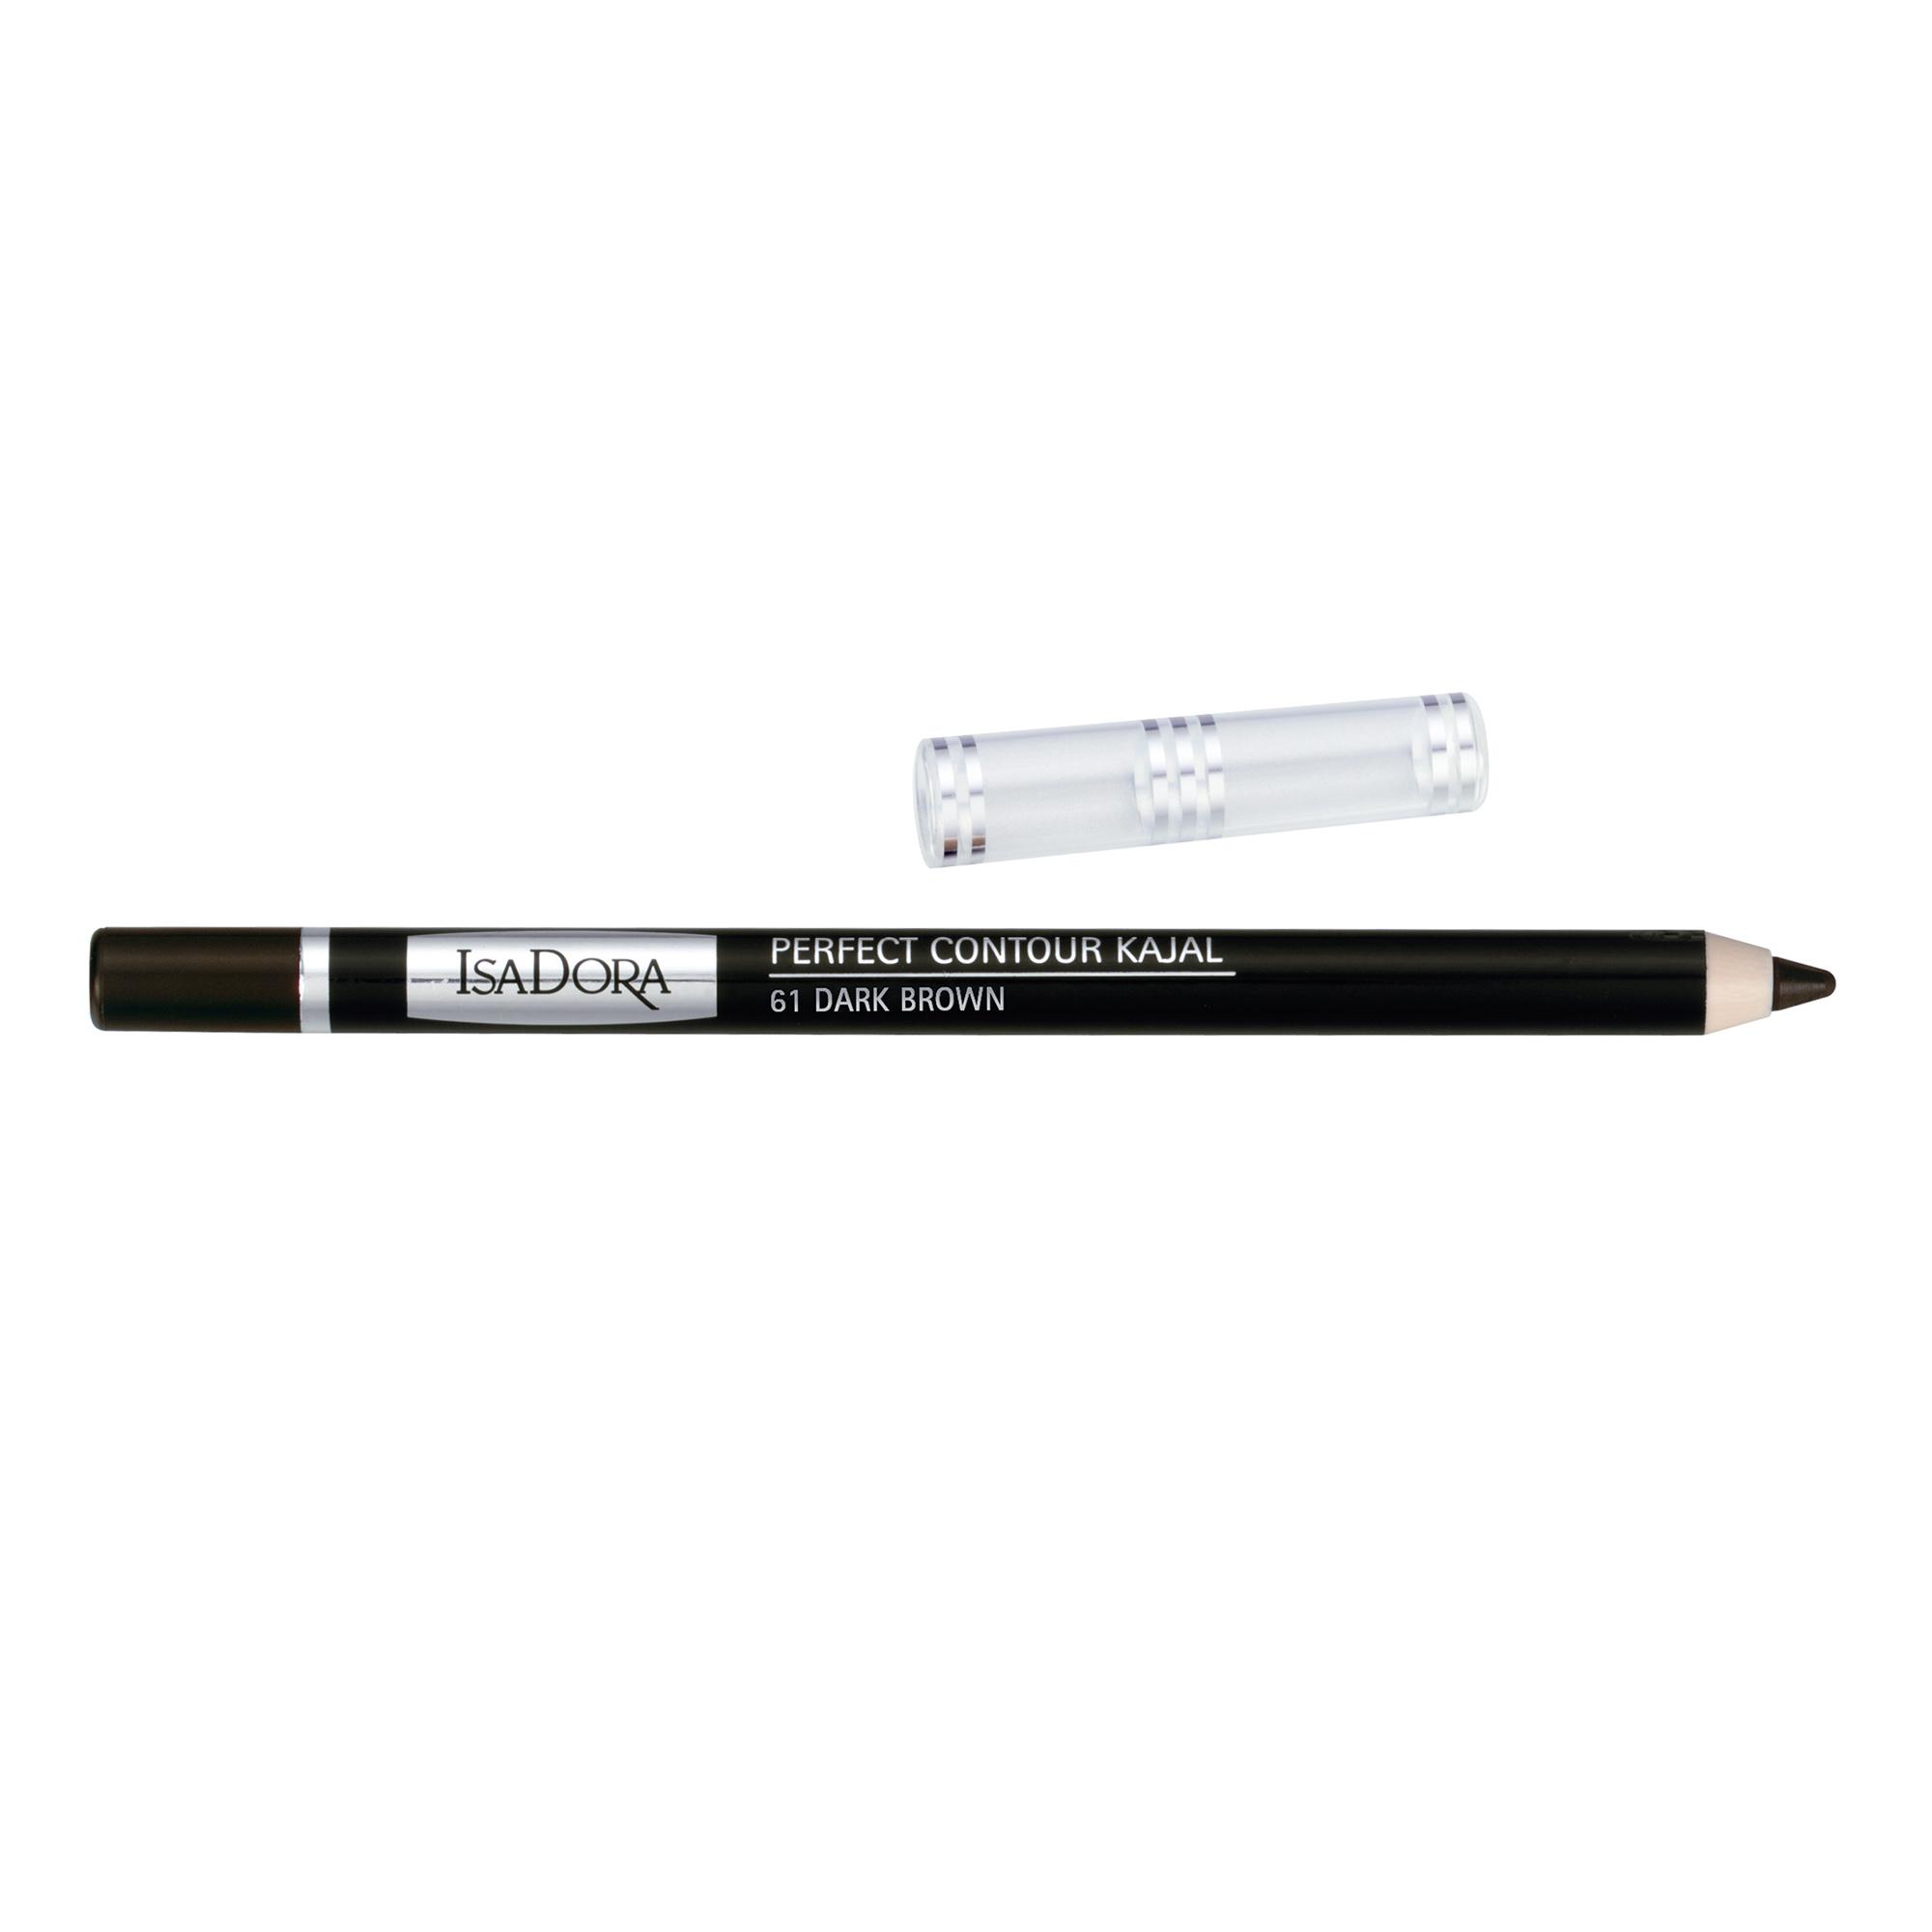 Perfect Contour Eye Pencil 61 Dark Brown